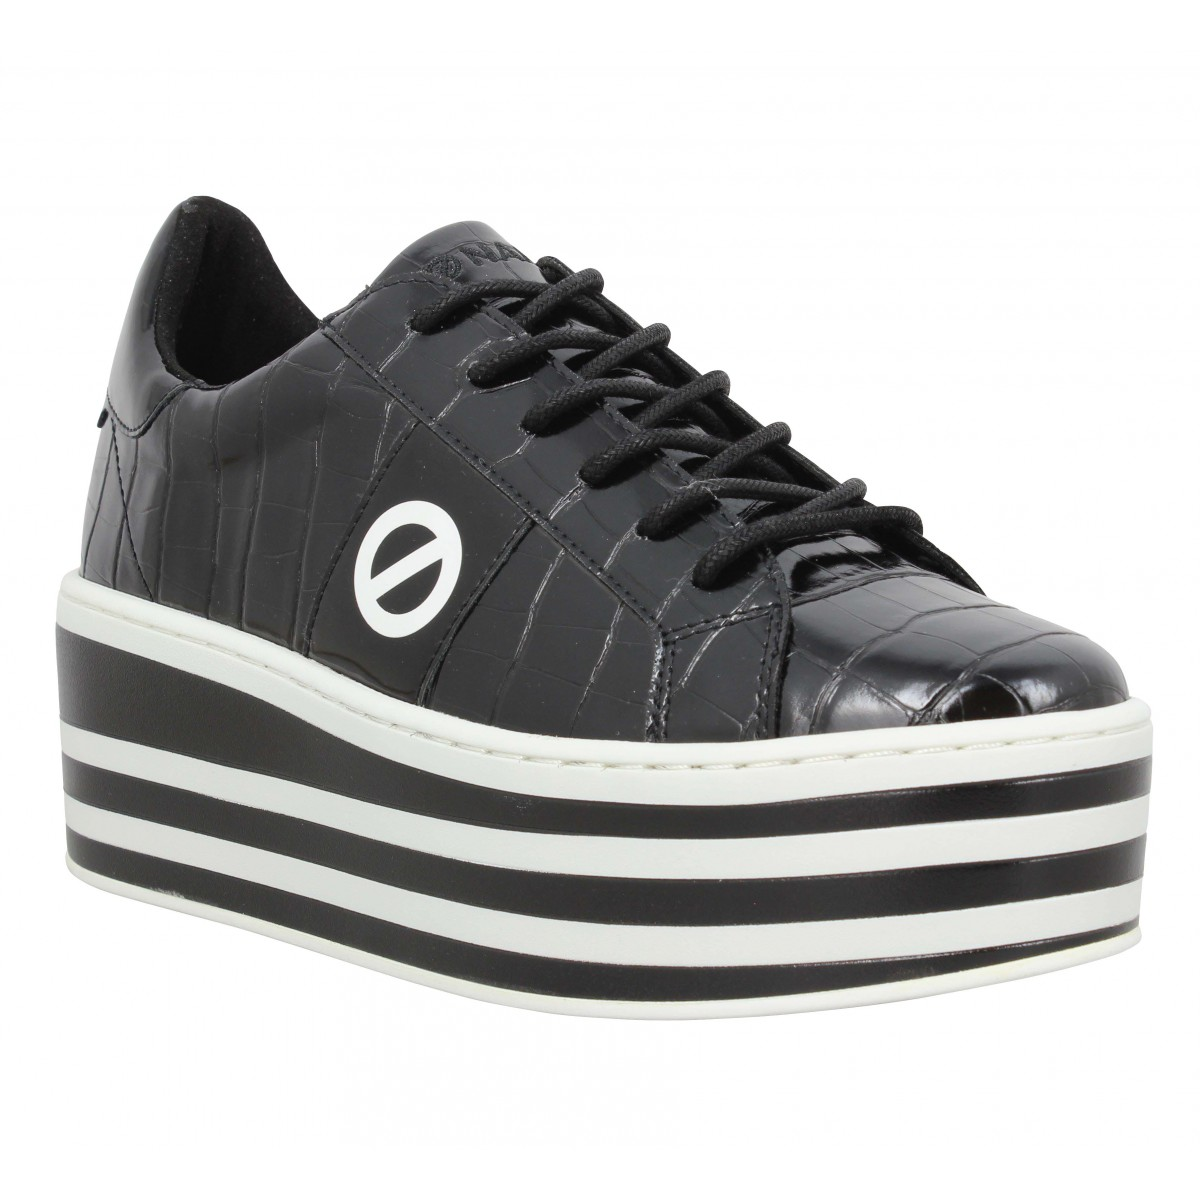 No Name Femme Boost Sneaker Shine Croco...